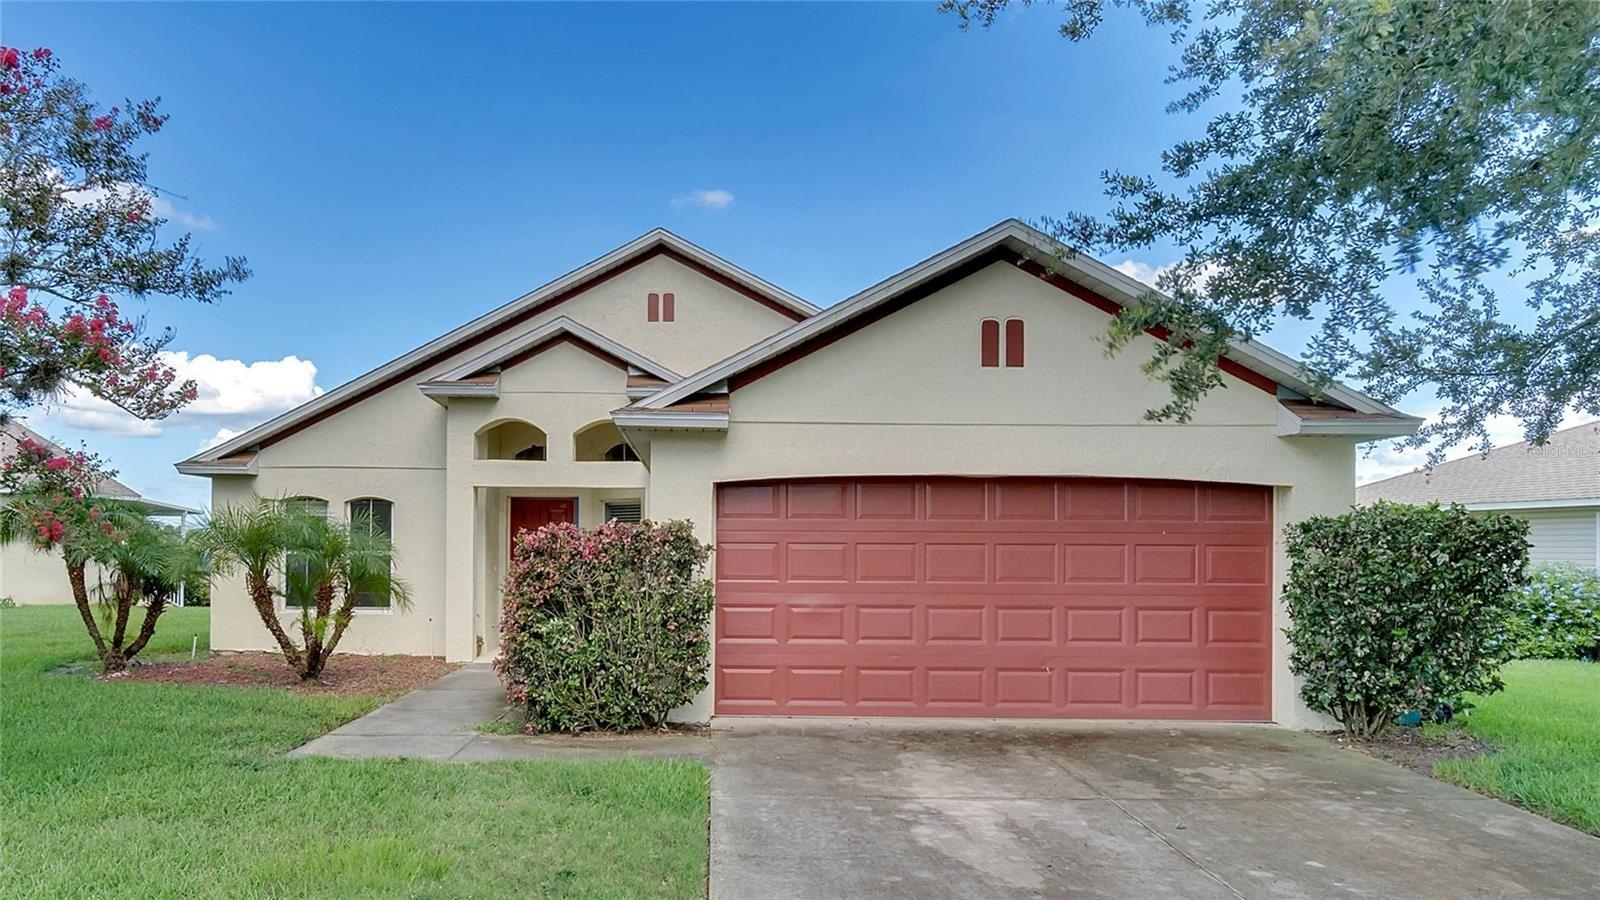 1715 LAKE VILLA DRIVE, Tavares, FL 32778 - #: O5958447